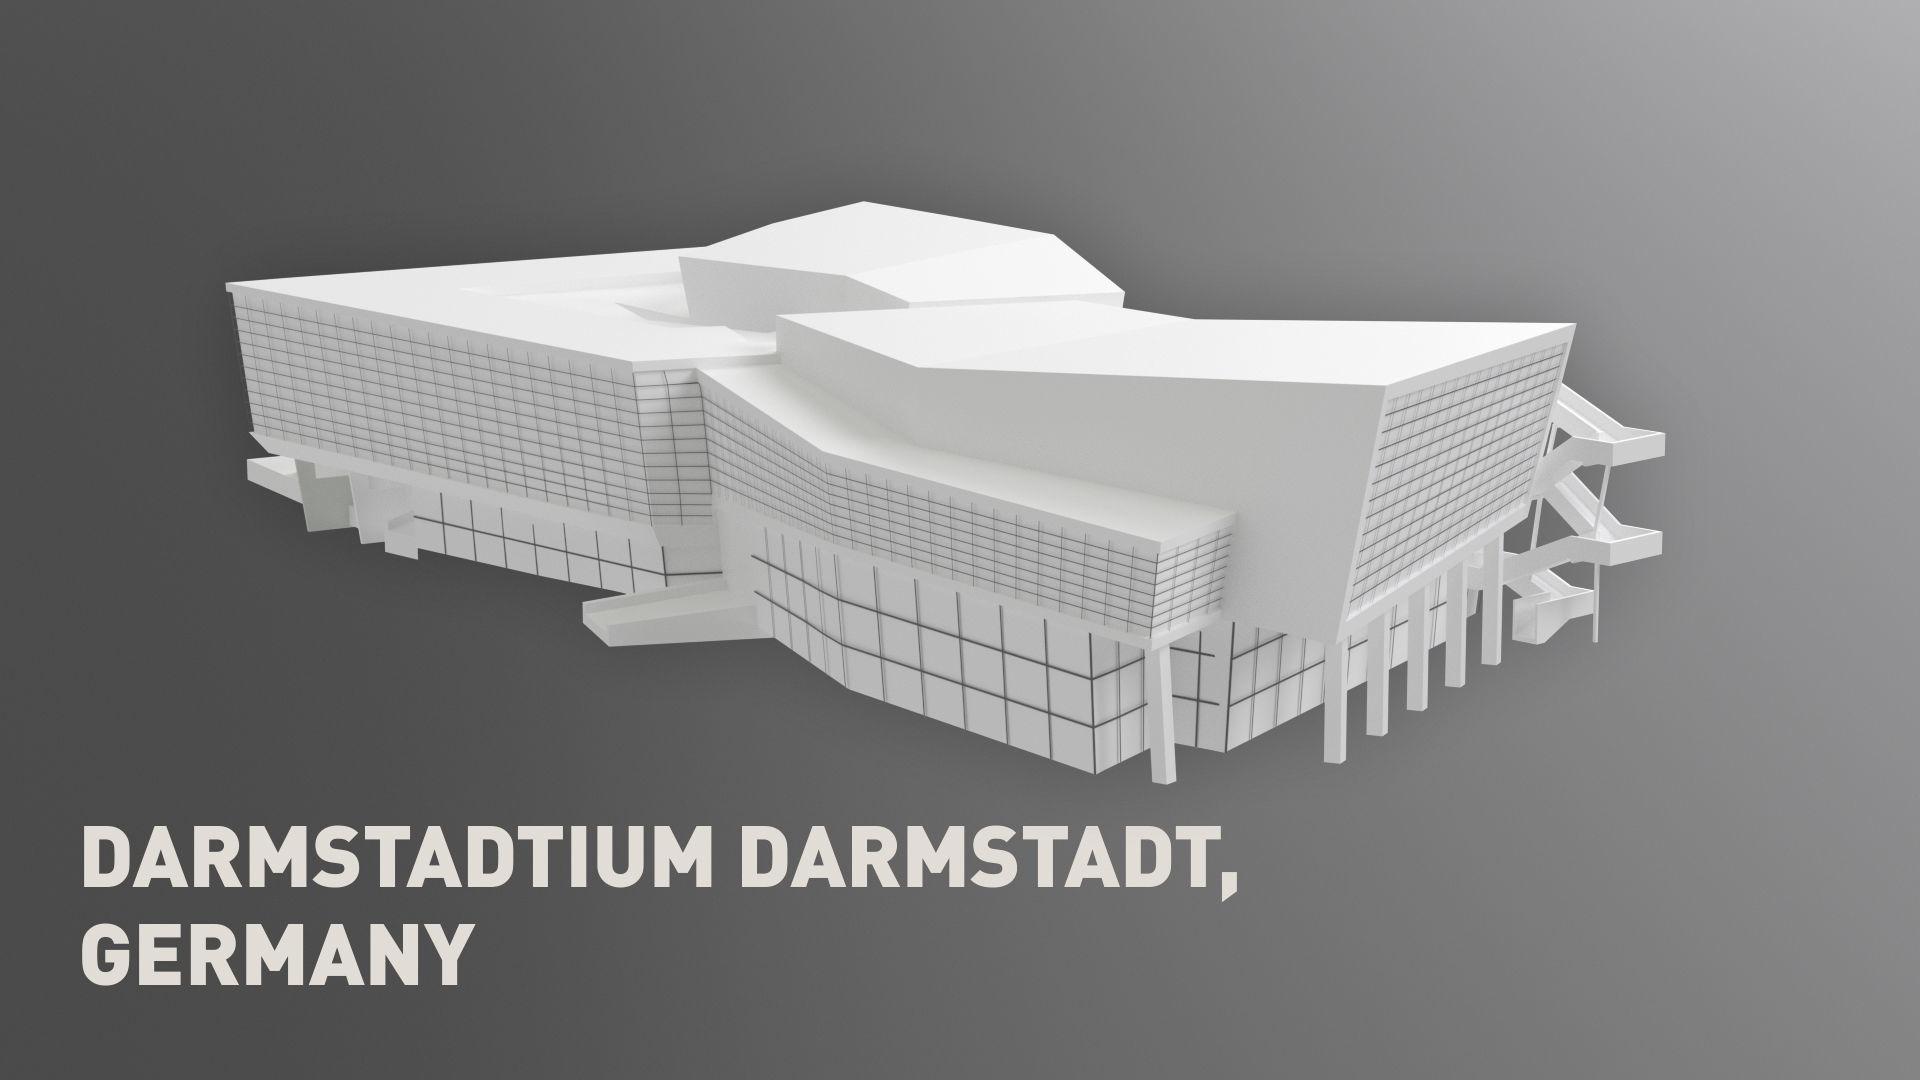 Darmstadtium Darmstadt Germany